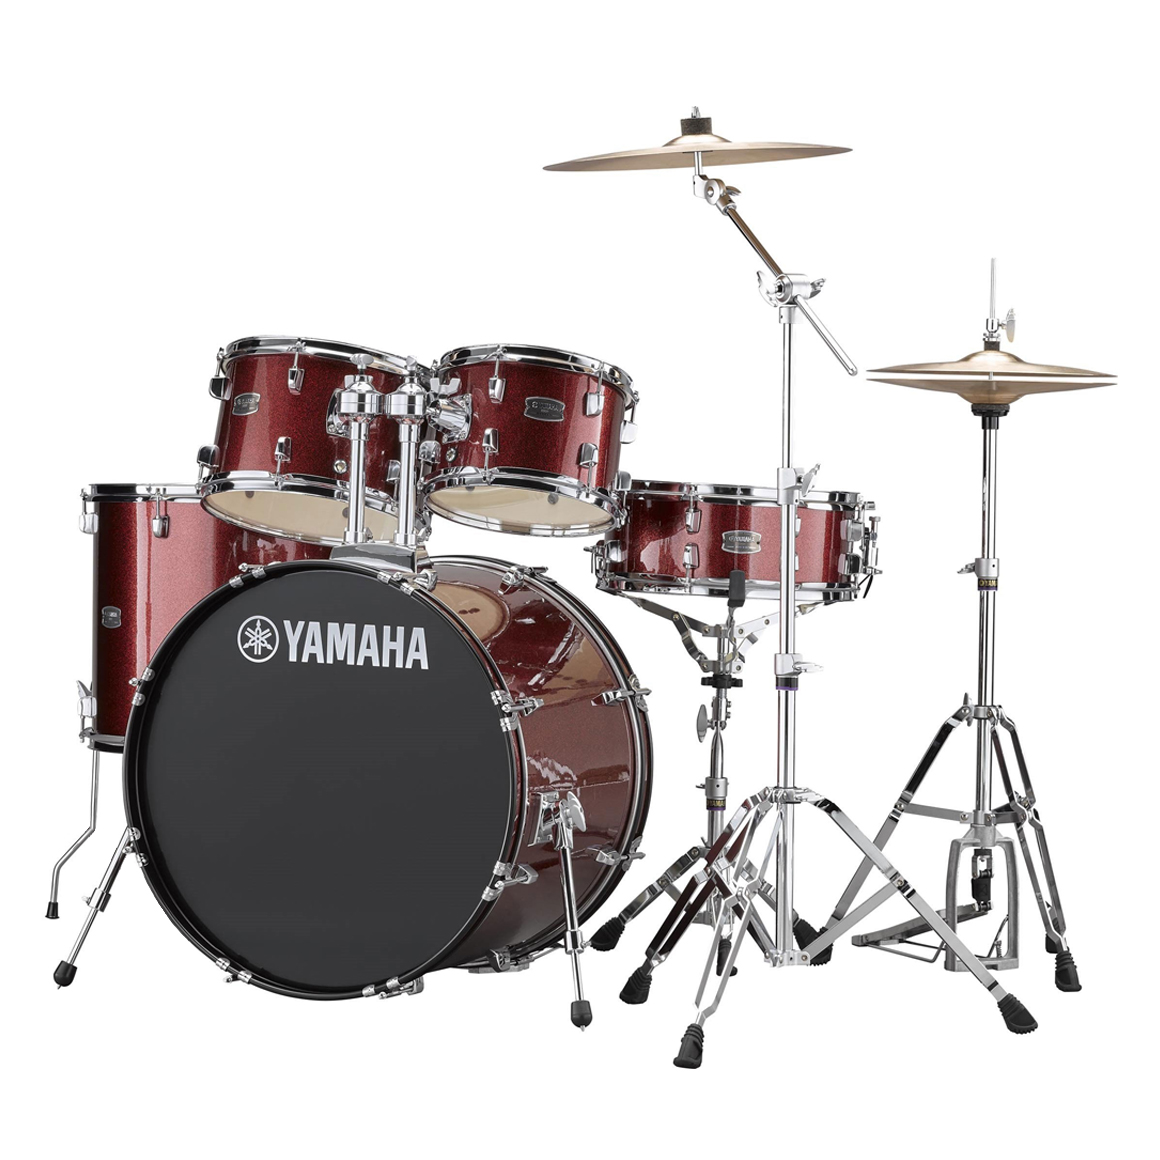 Trống jazz Yamaha Drum